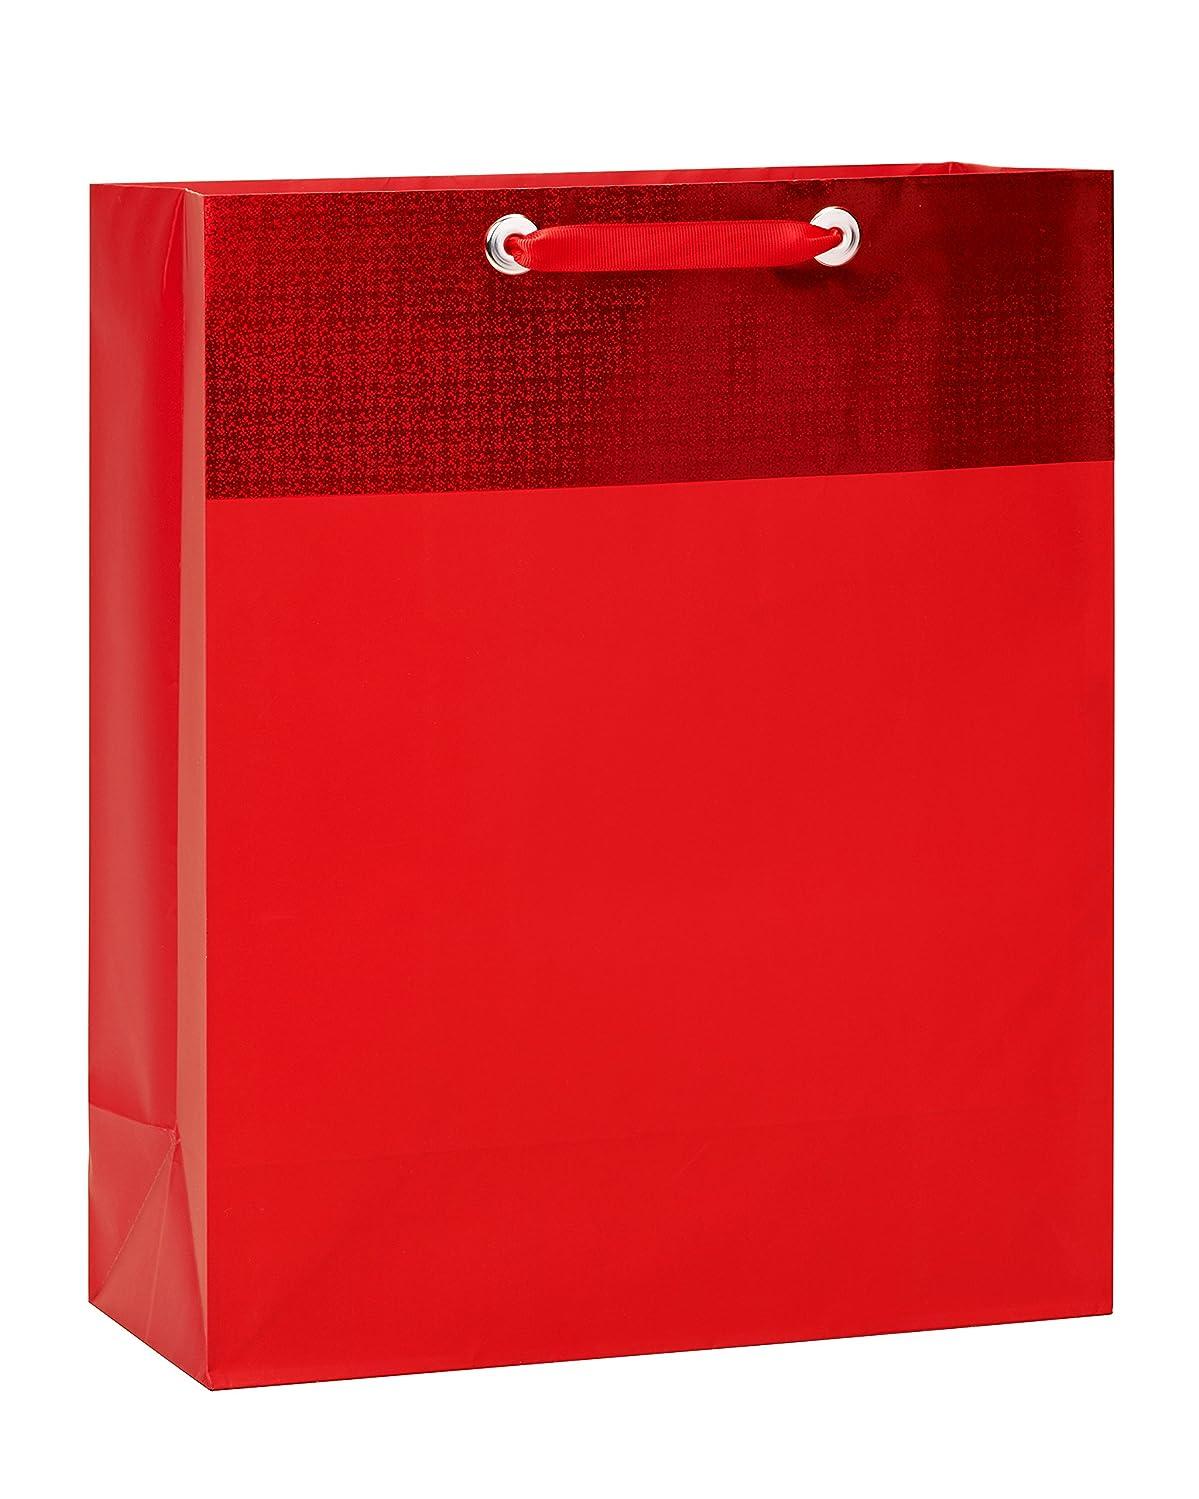 American Greetings XL Gift Bag, Red